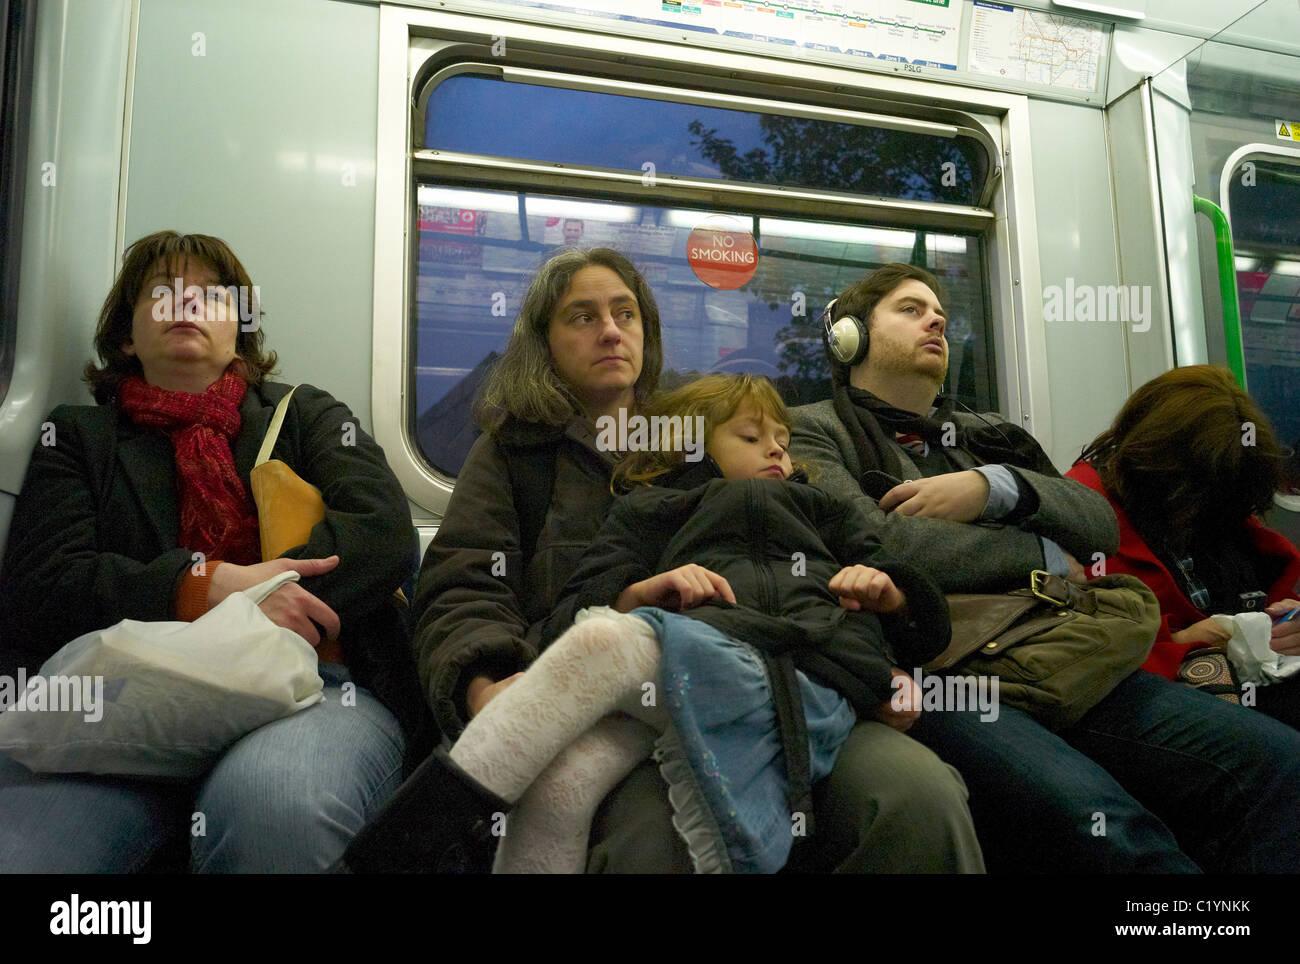 People on the London underground or Tube London England - Stock Image